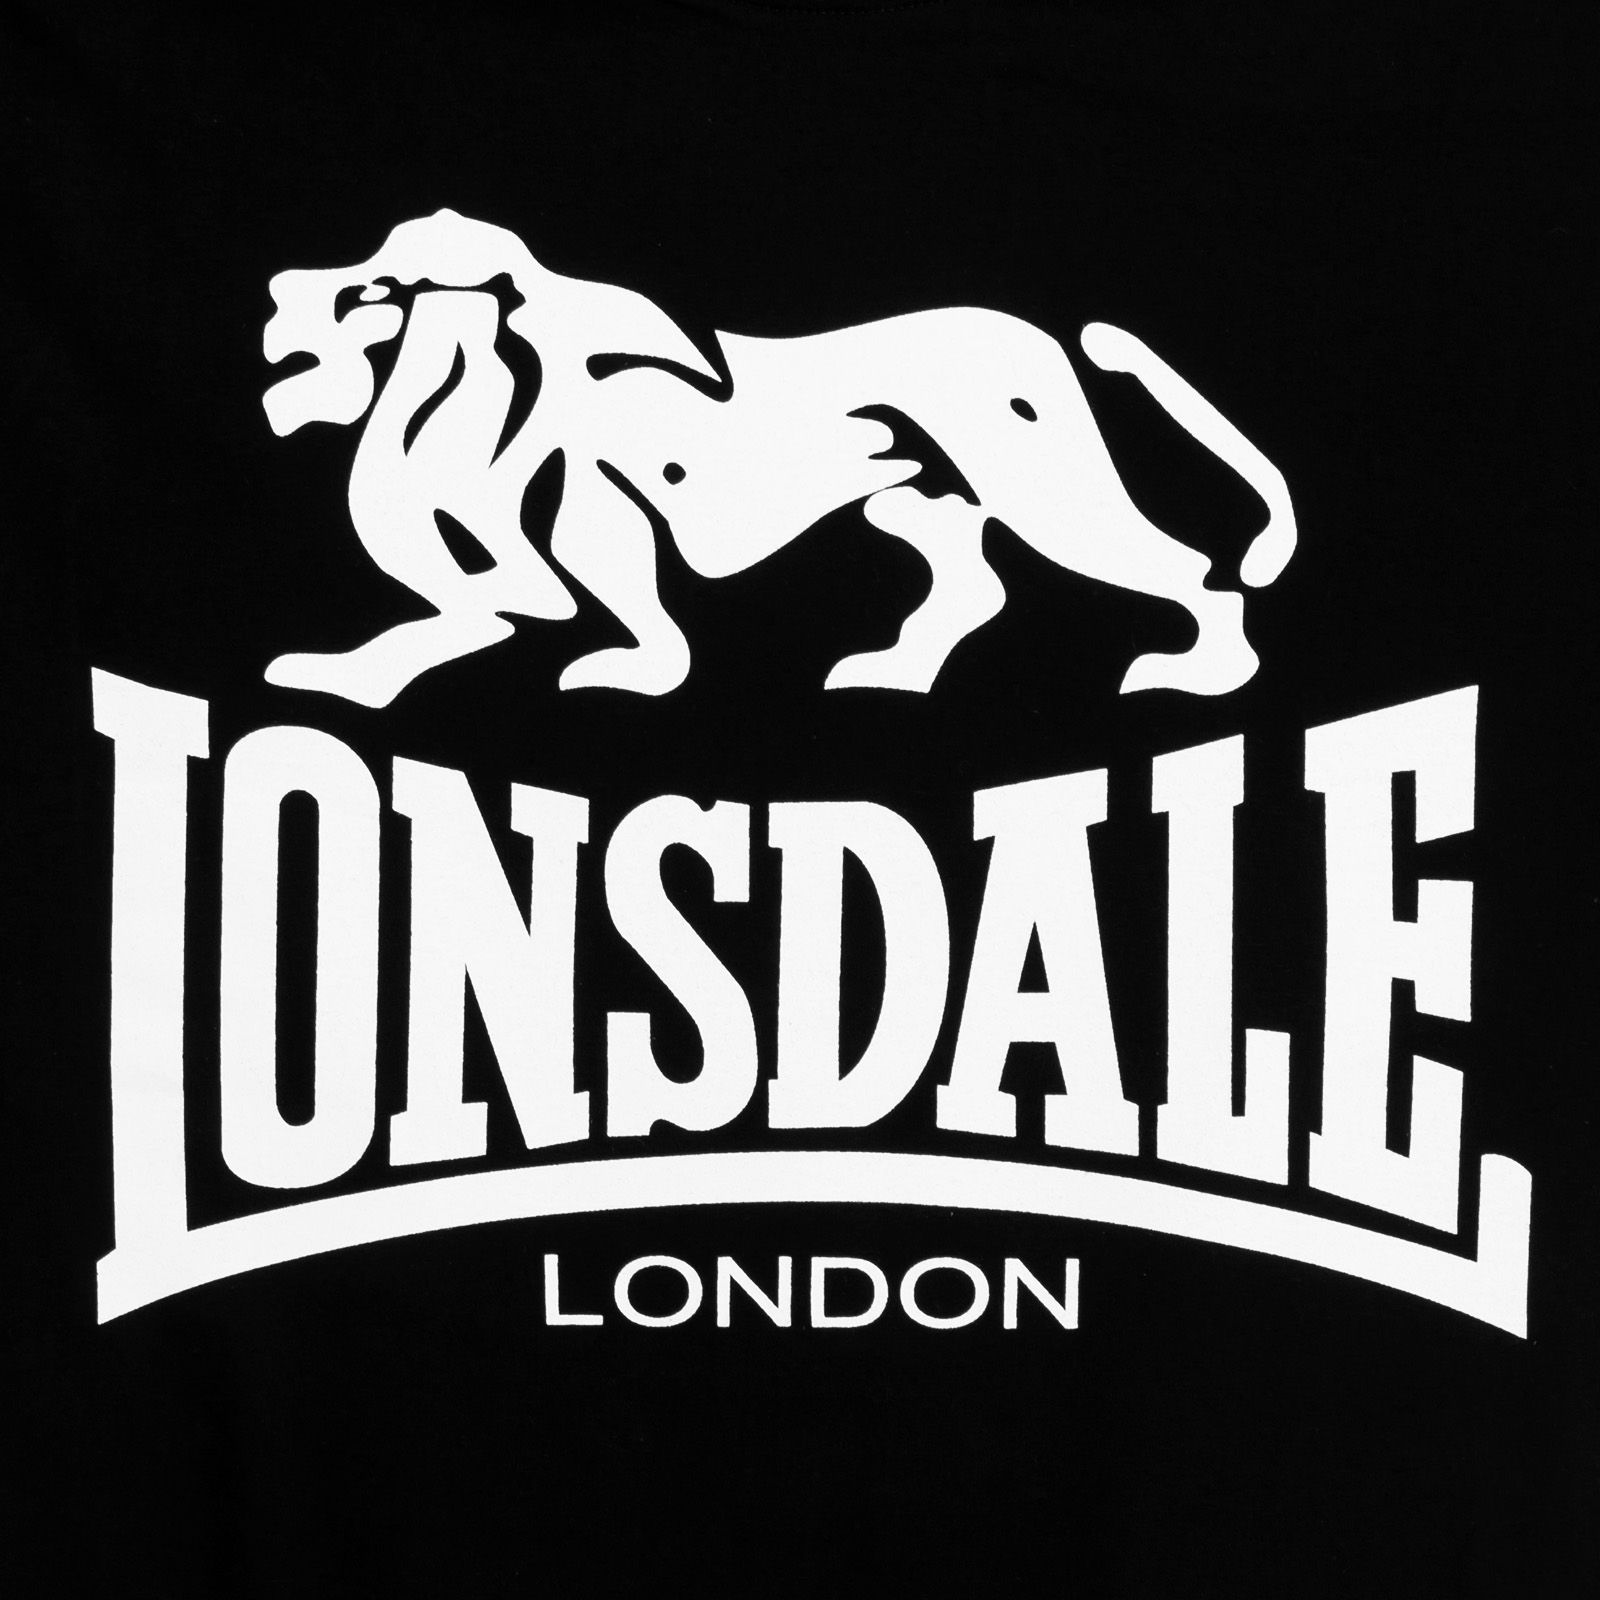 Футболка «Lonsdale» с принтом